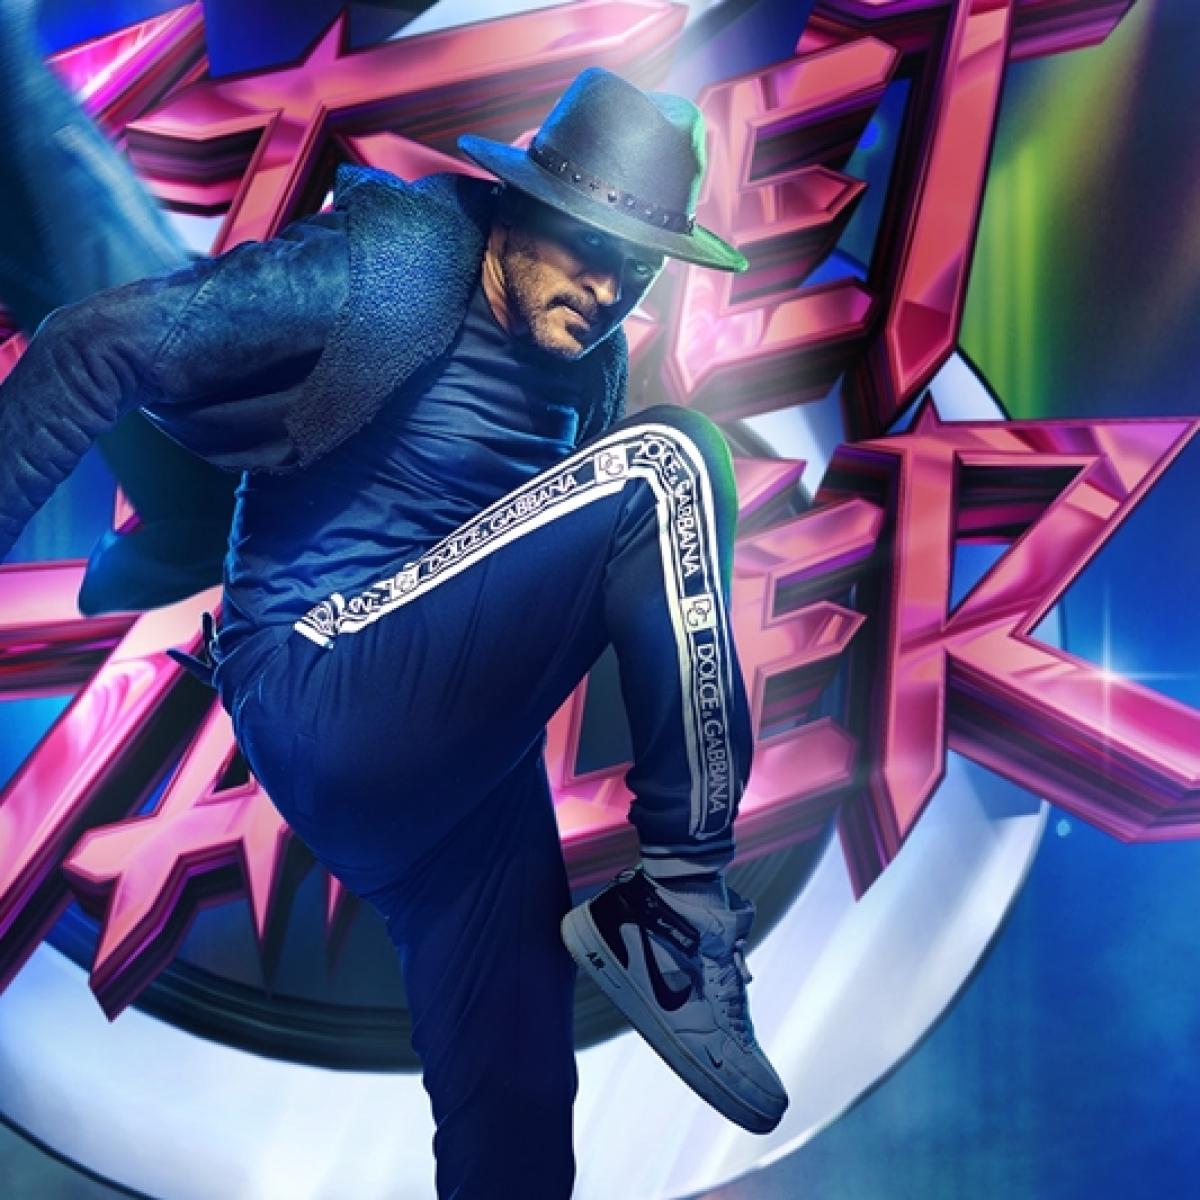 Street Dancer 3D: Prabhu Deva gives Michael Jackson vibes in first look